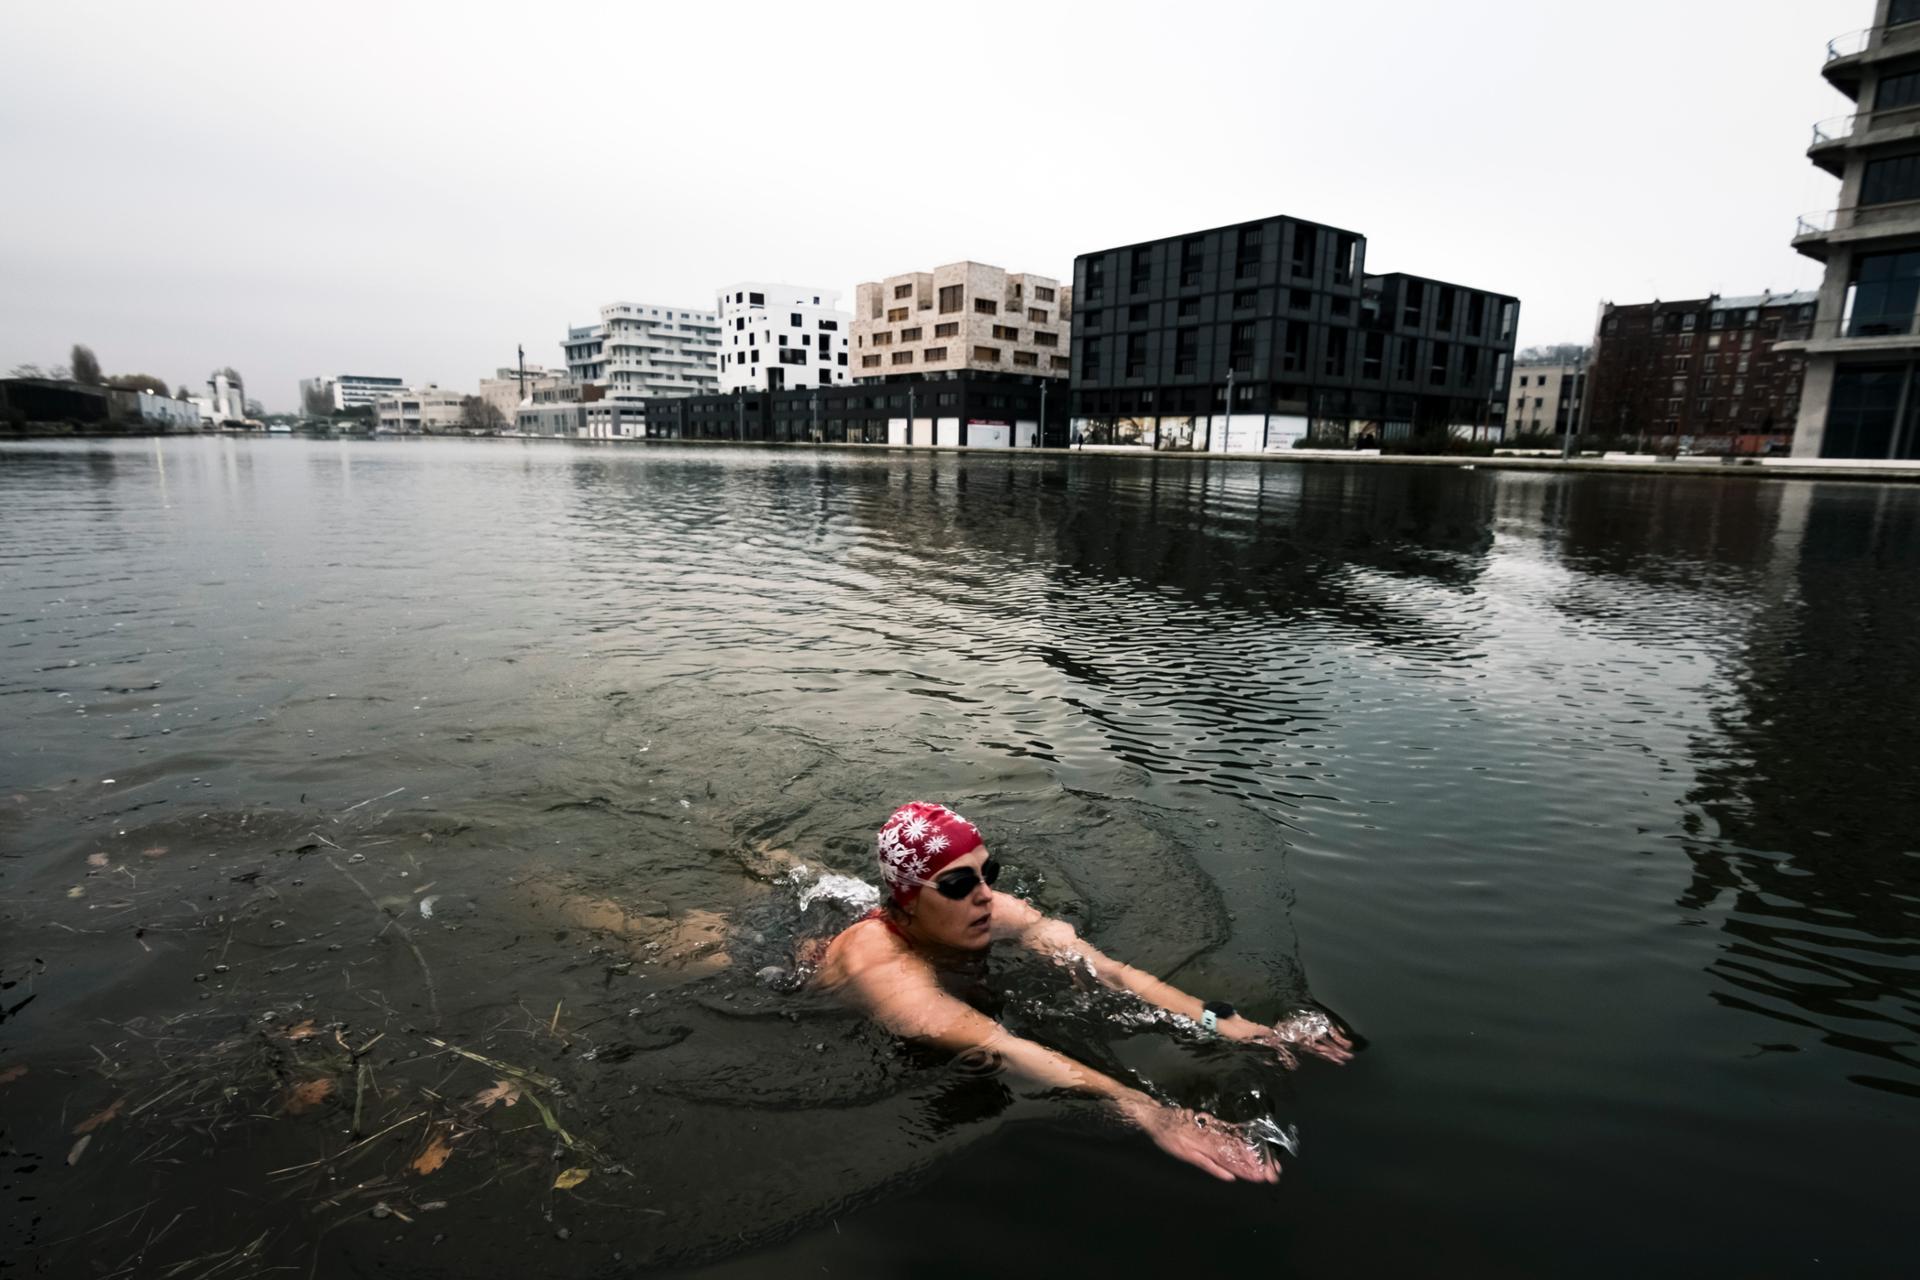 Urban swimming